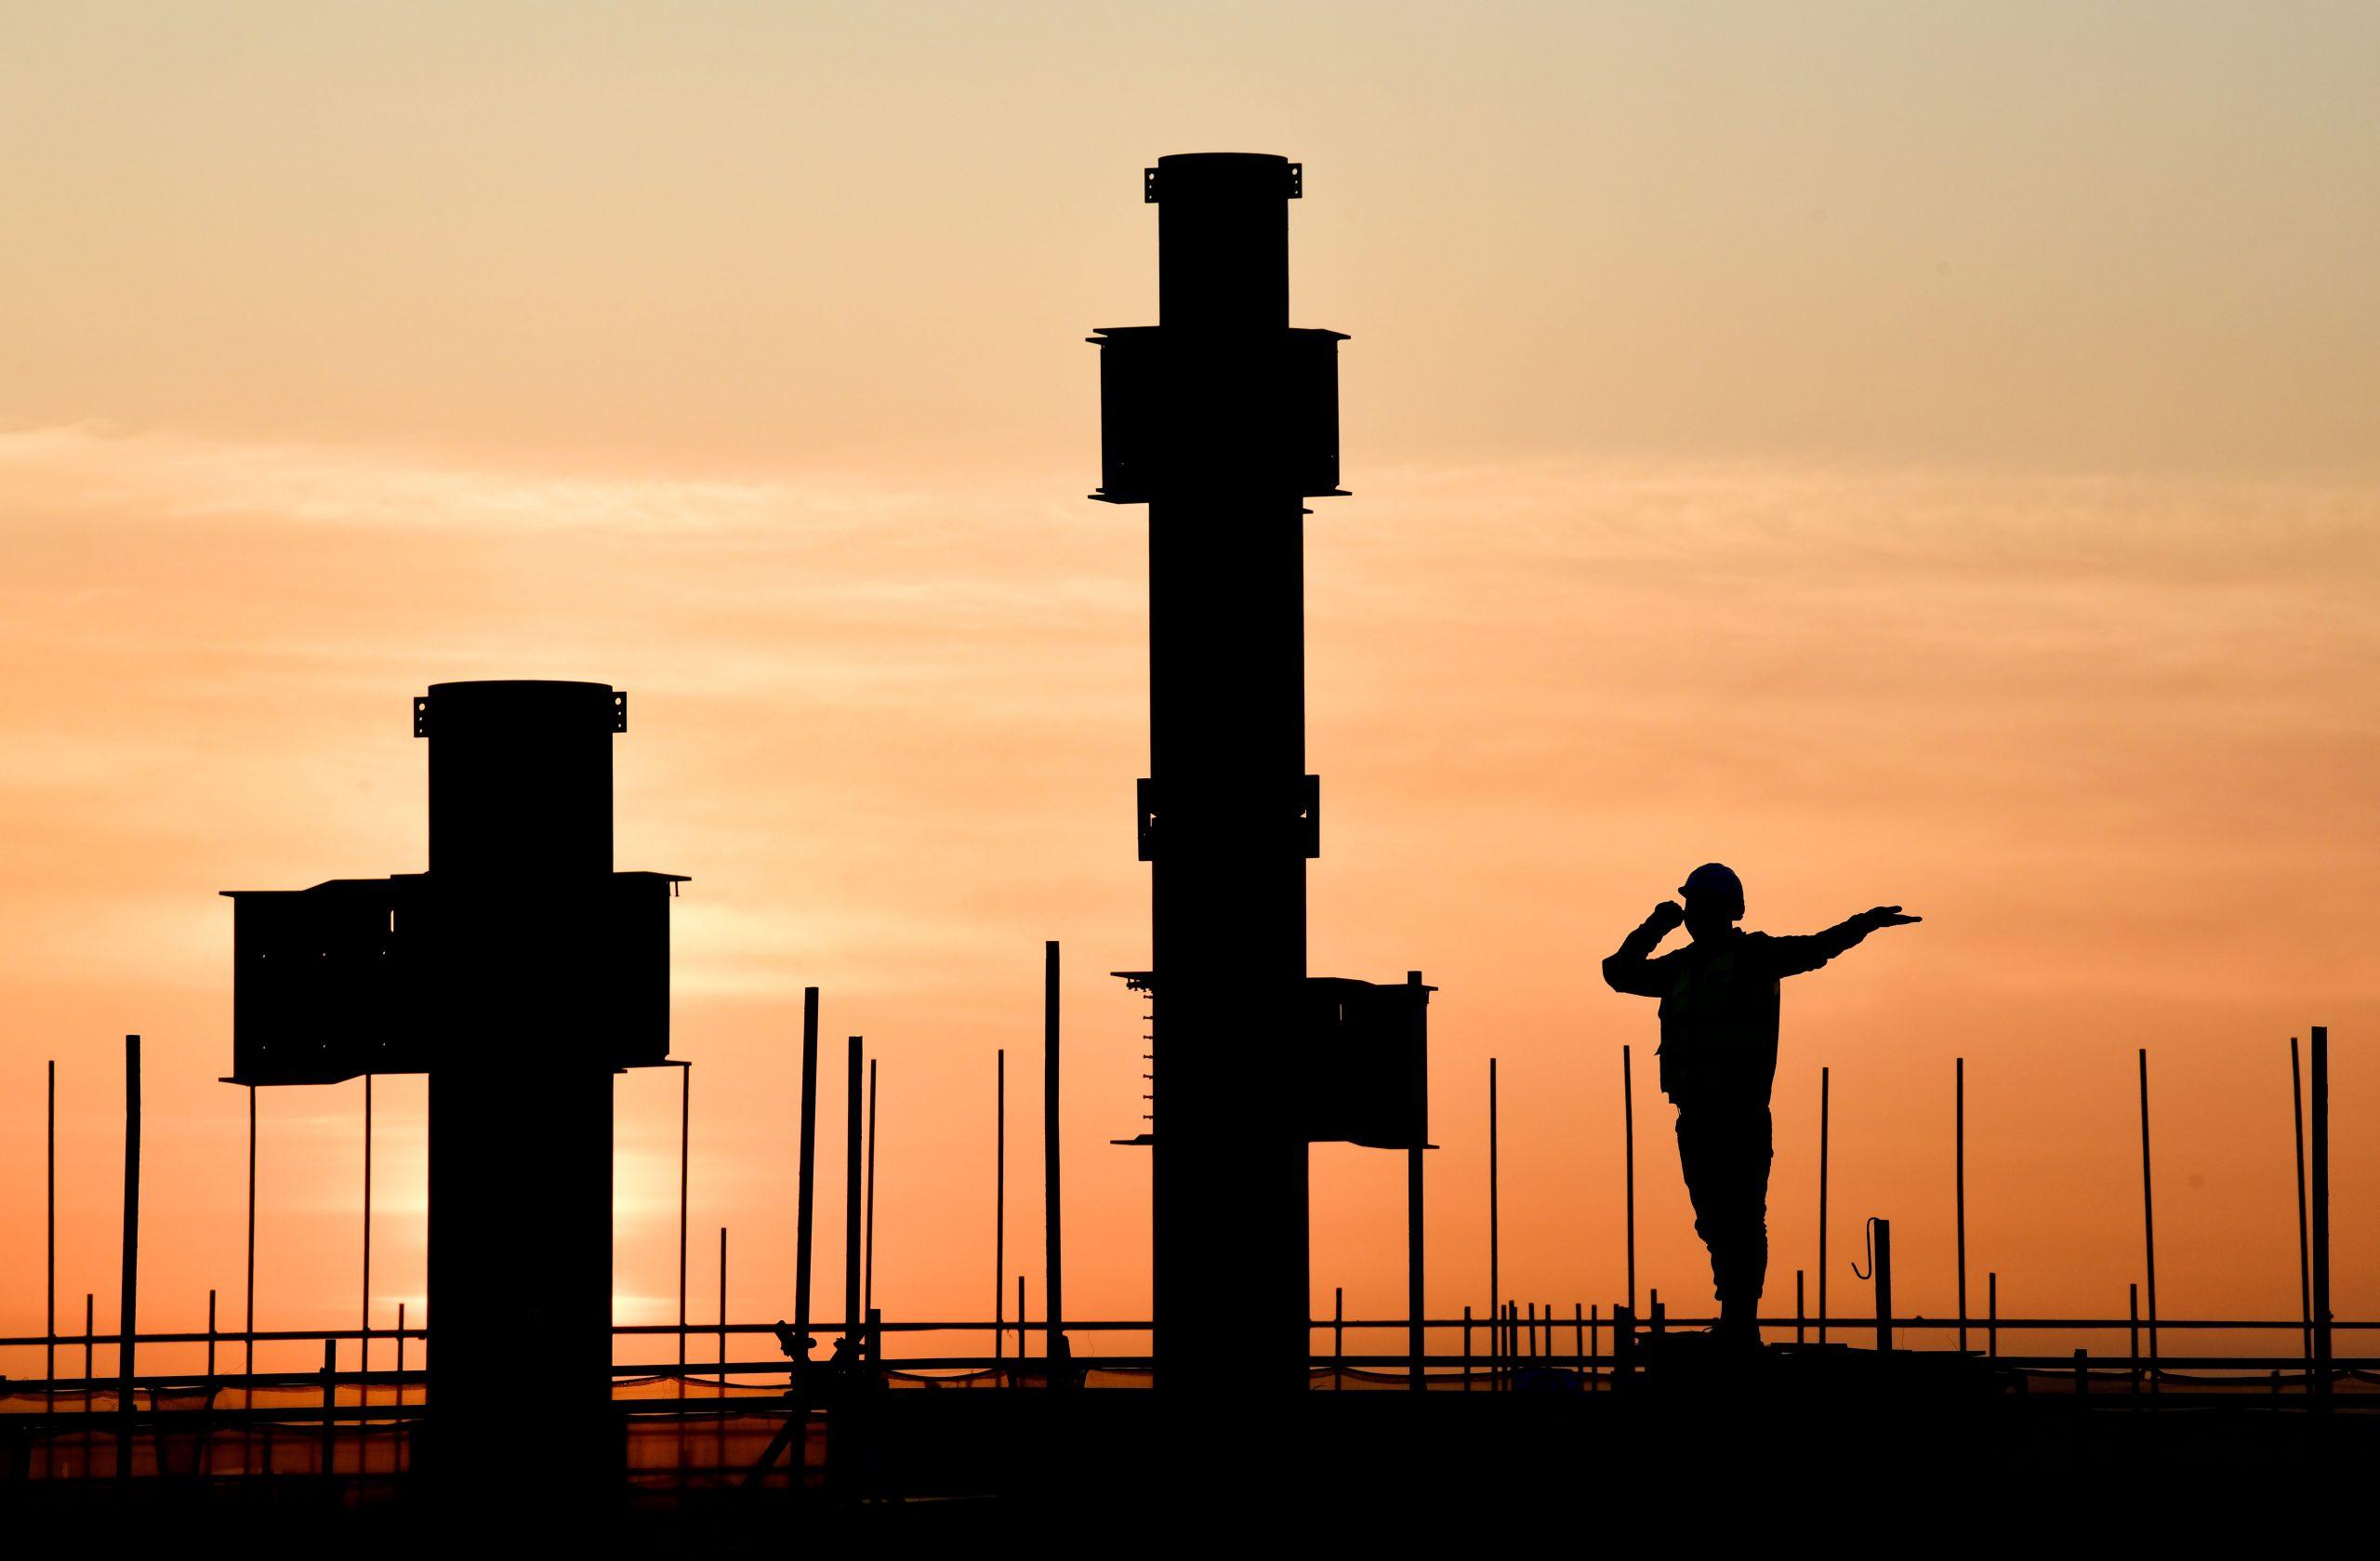 #CHINA-INNER MONGOLIA-HOHHOT-CONSTRUCTORS(CN)